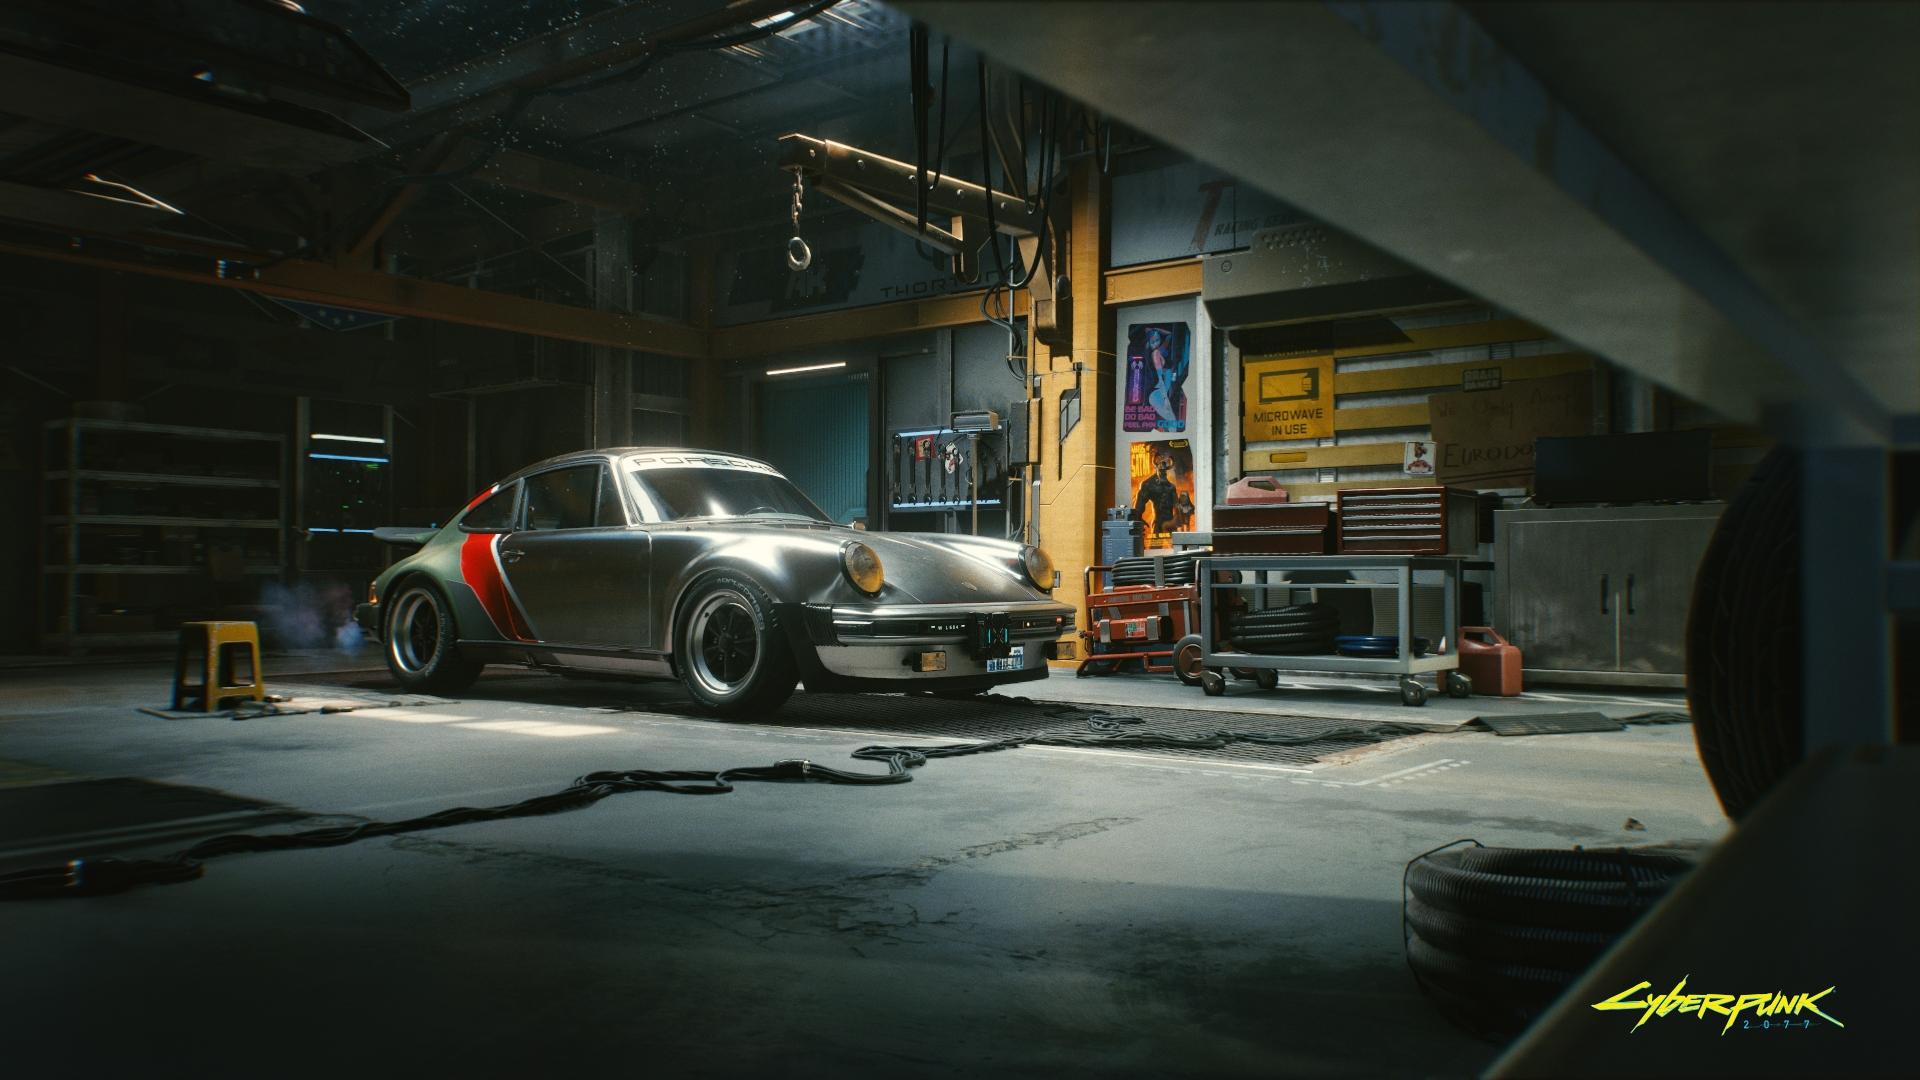 Johnny Silverhand's Porsche 911 Turbo - Cyberpunk 2077